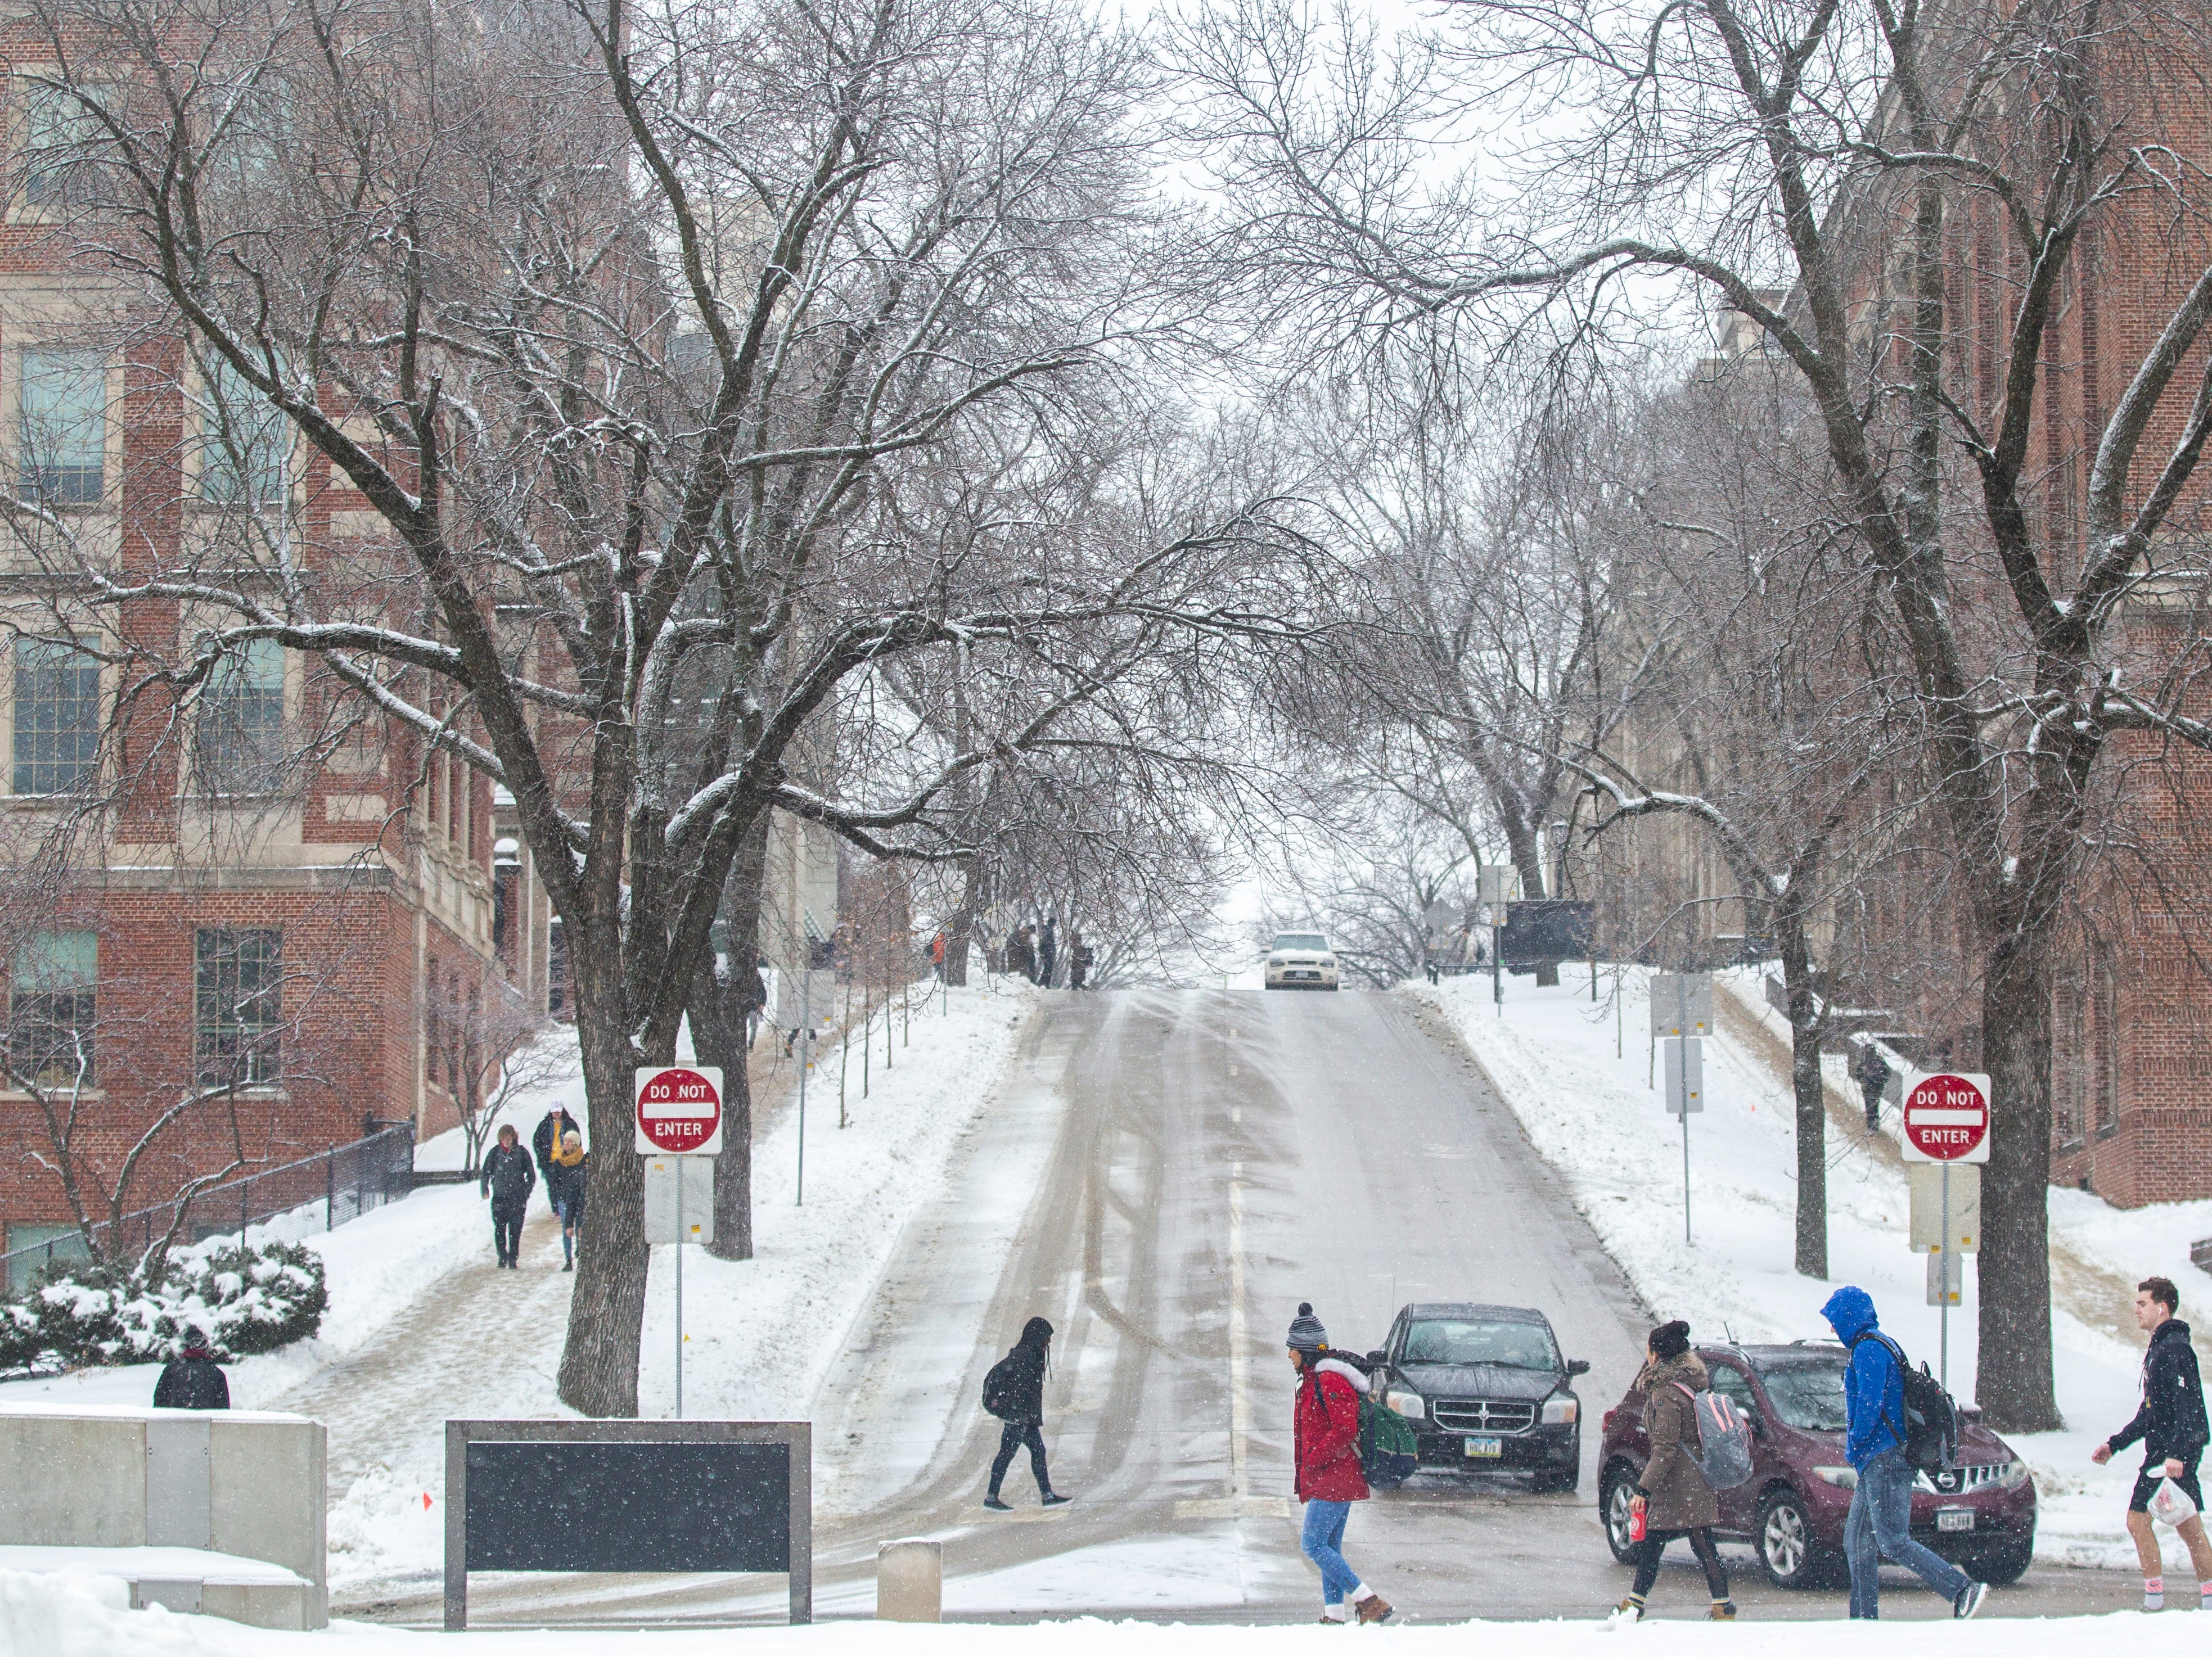 Students walk along Madison Street while cars drive down Market Street as light snow falls on Tuesday, Jan. 22, 2019, in Iowa City, Iowa.